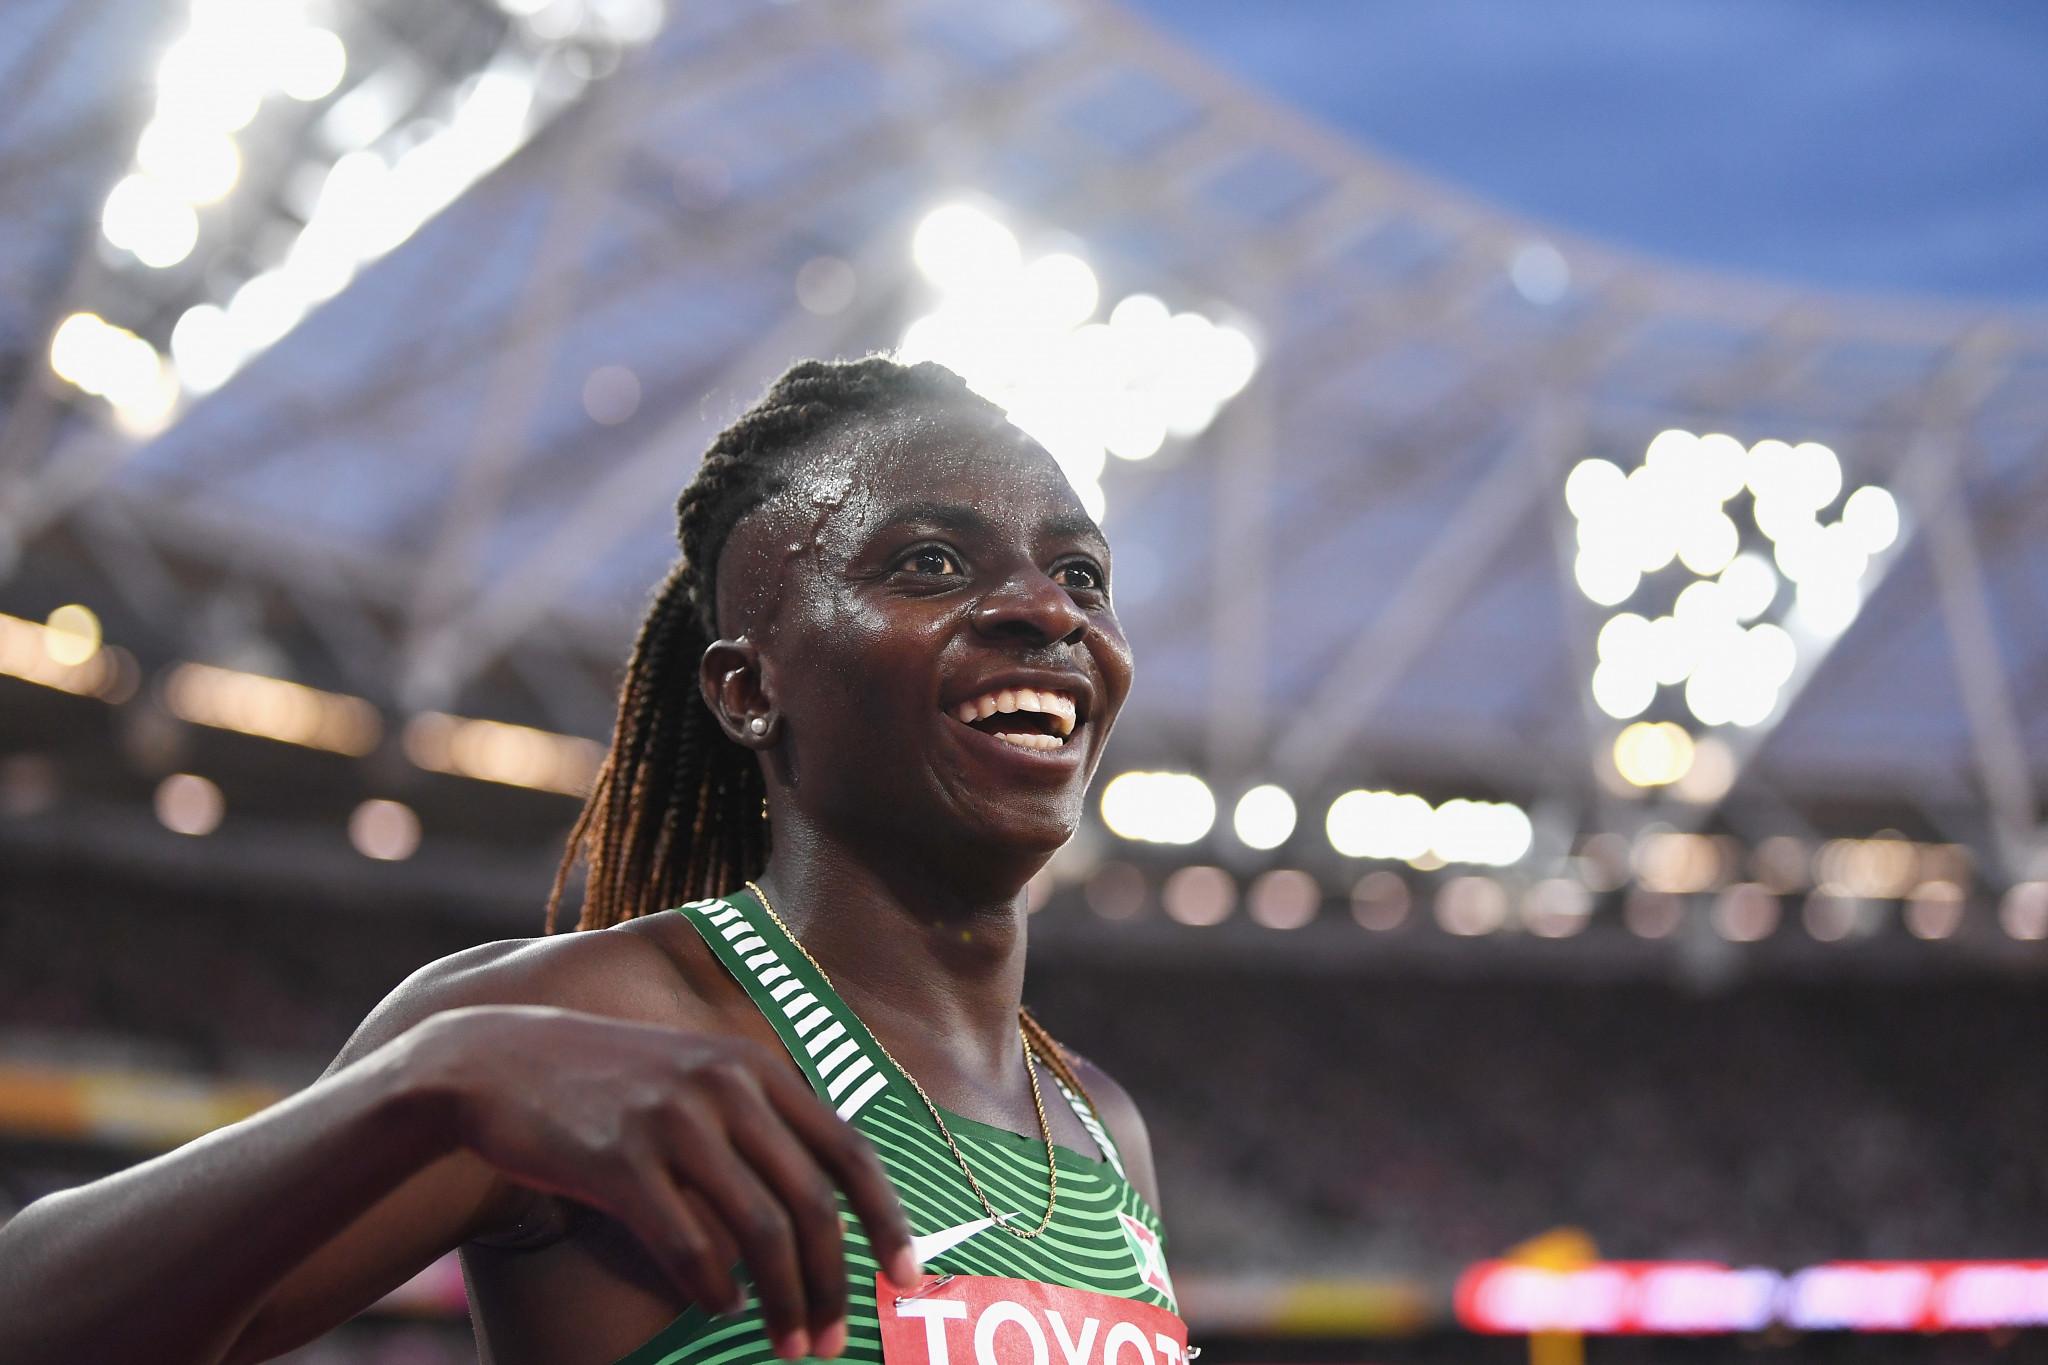 Niyonsaba breaks women's 2,000m world record in Zagreb as three Olympic champions win